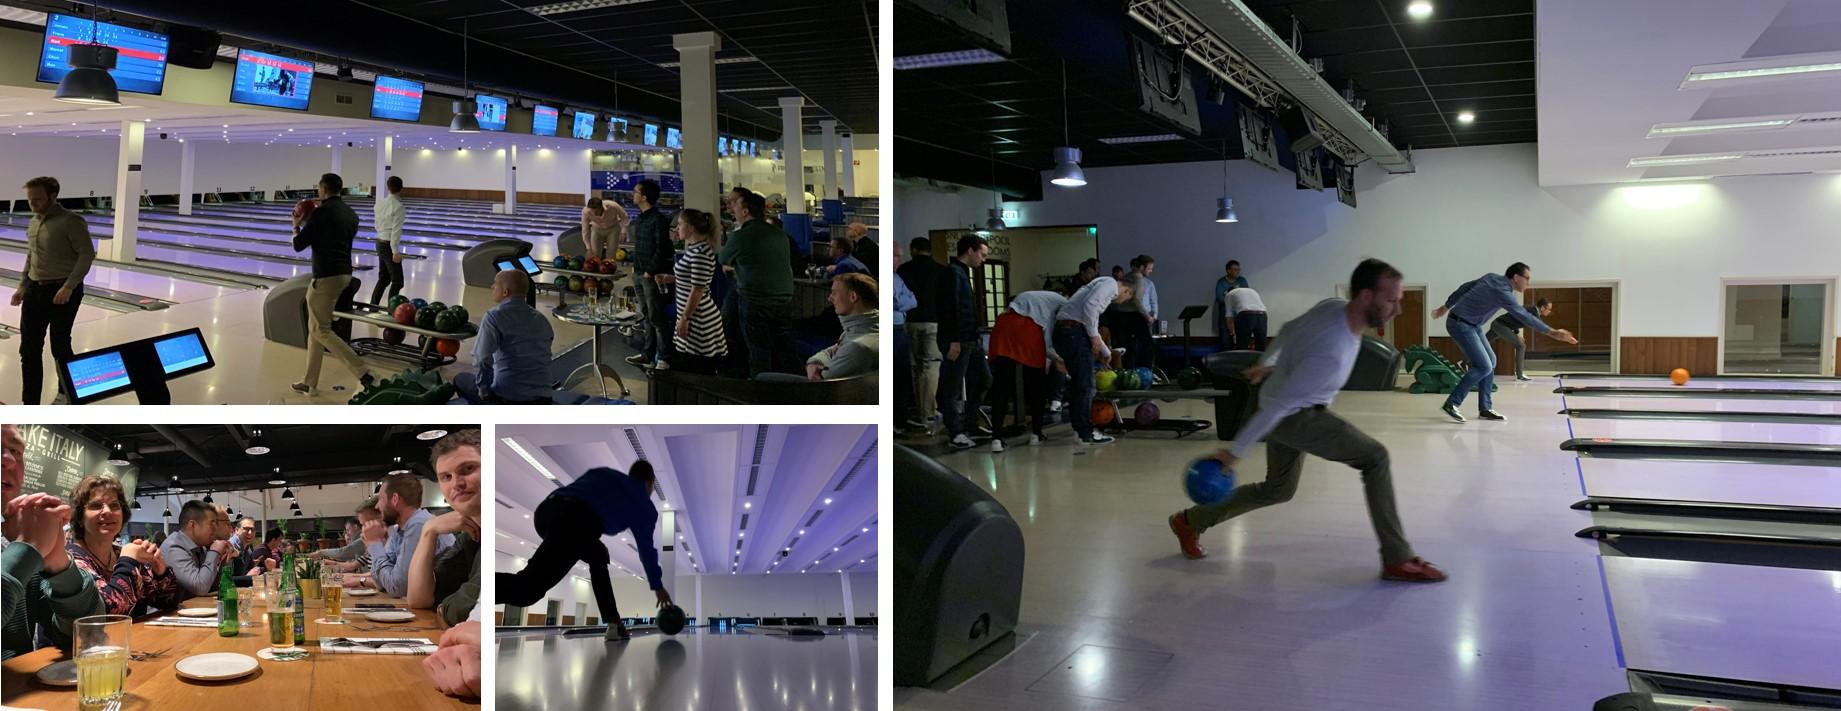 teammeeting-fun-bowlen